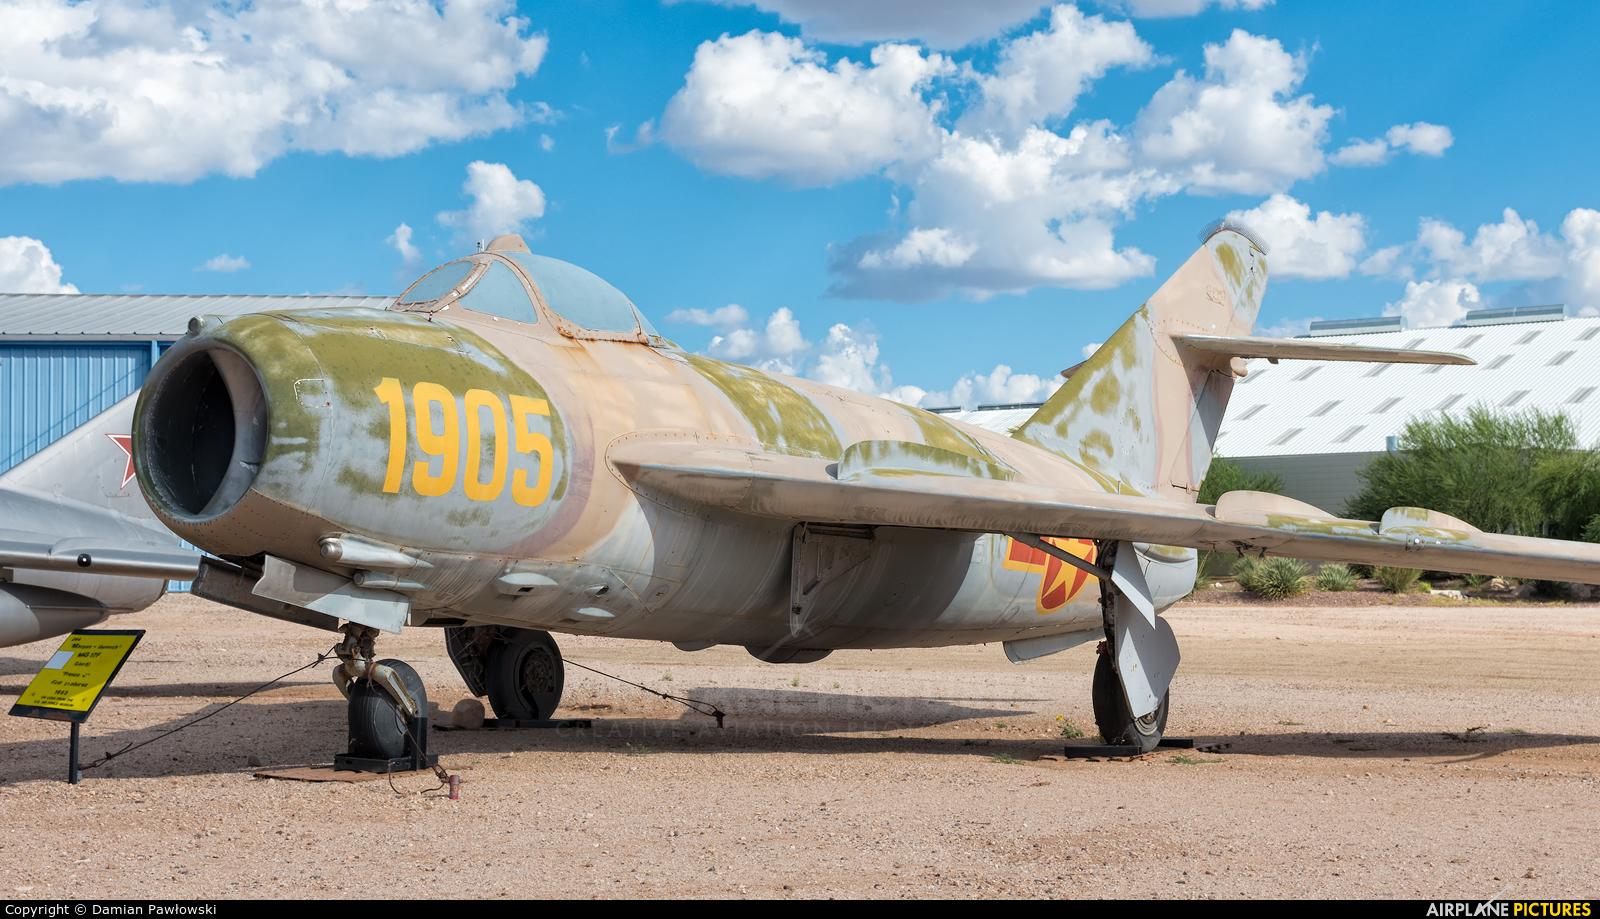 Vietnam (North) - Air Force 1905 aircraft at Tucson - Pima Air & Space Museum